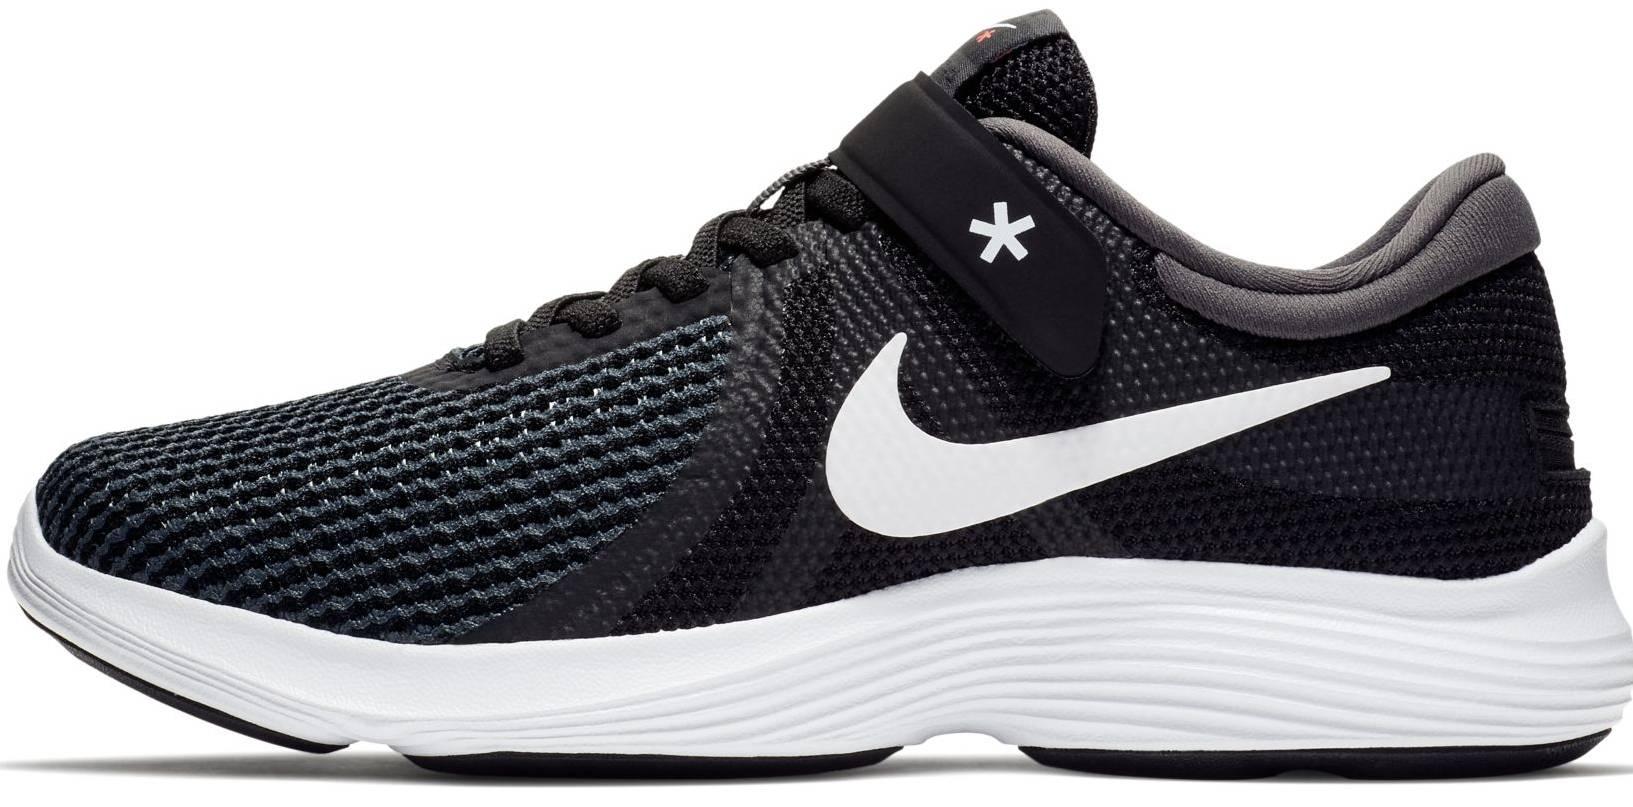 herida Catarata Ya que  8 Reasons to/NOT to Buy Nike Revolution 4 FlyEase (Feb 2021) | RunRepeat